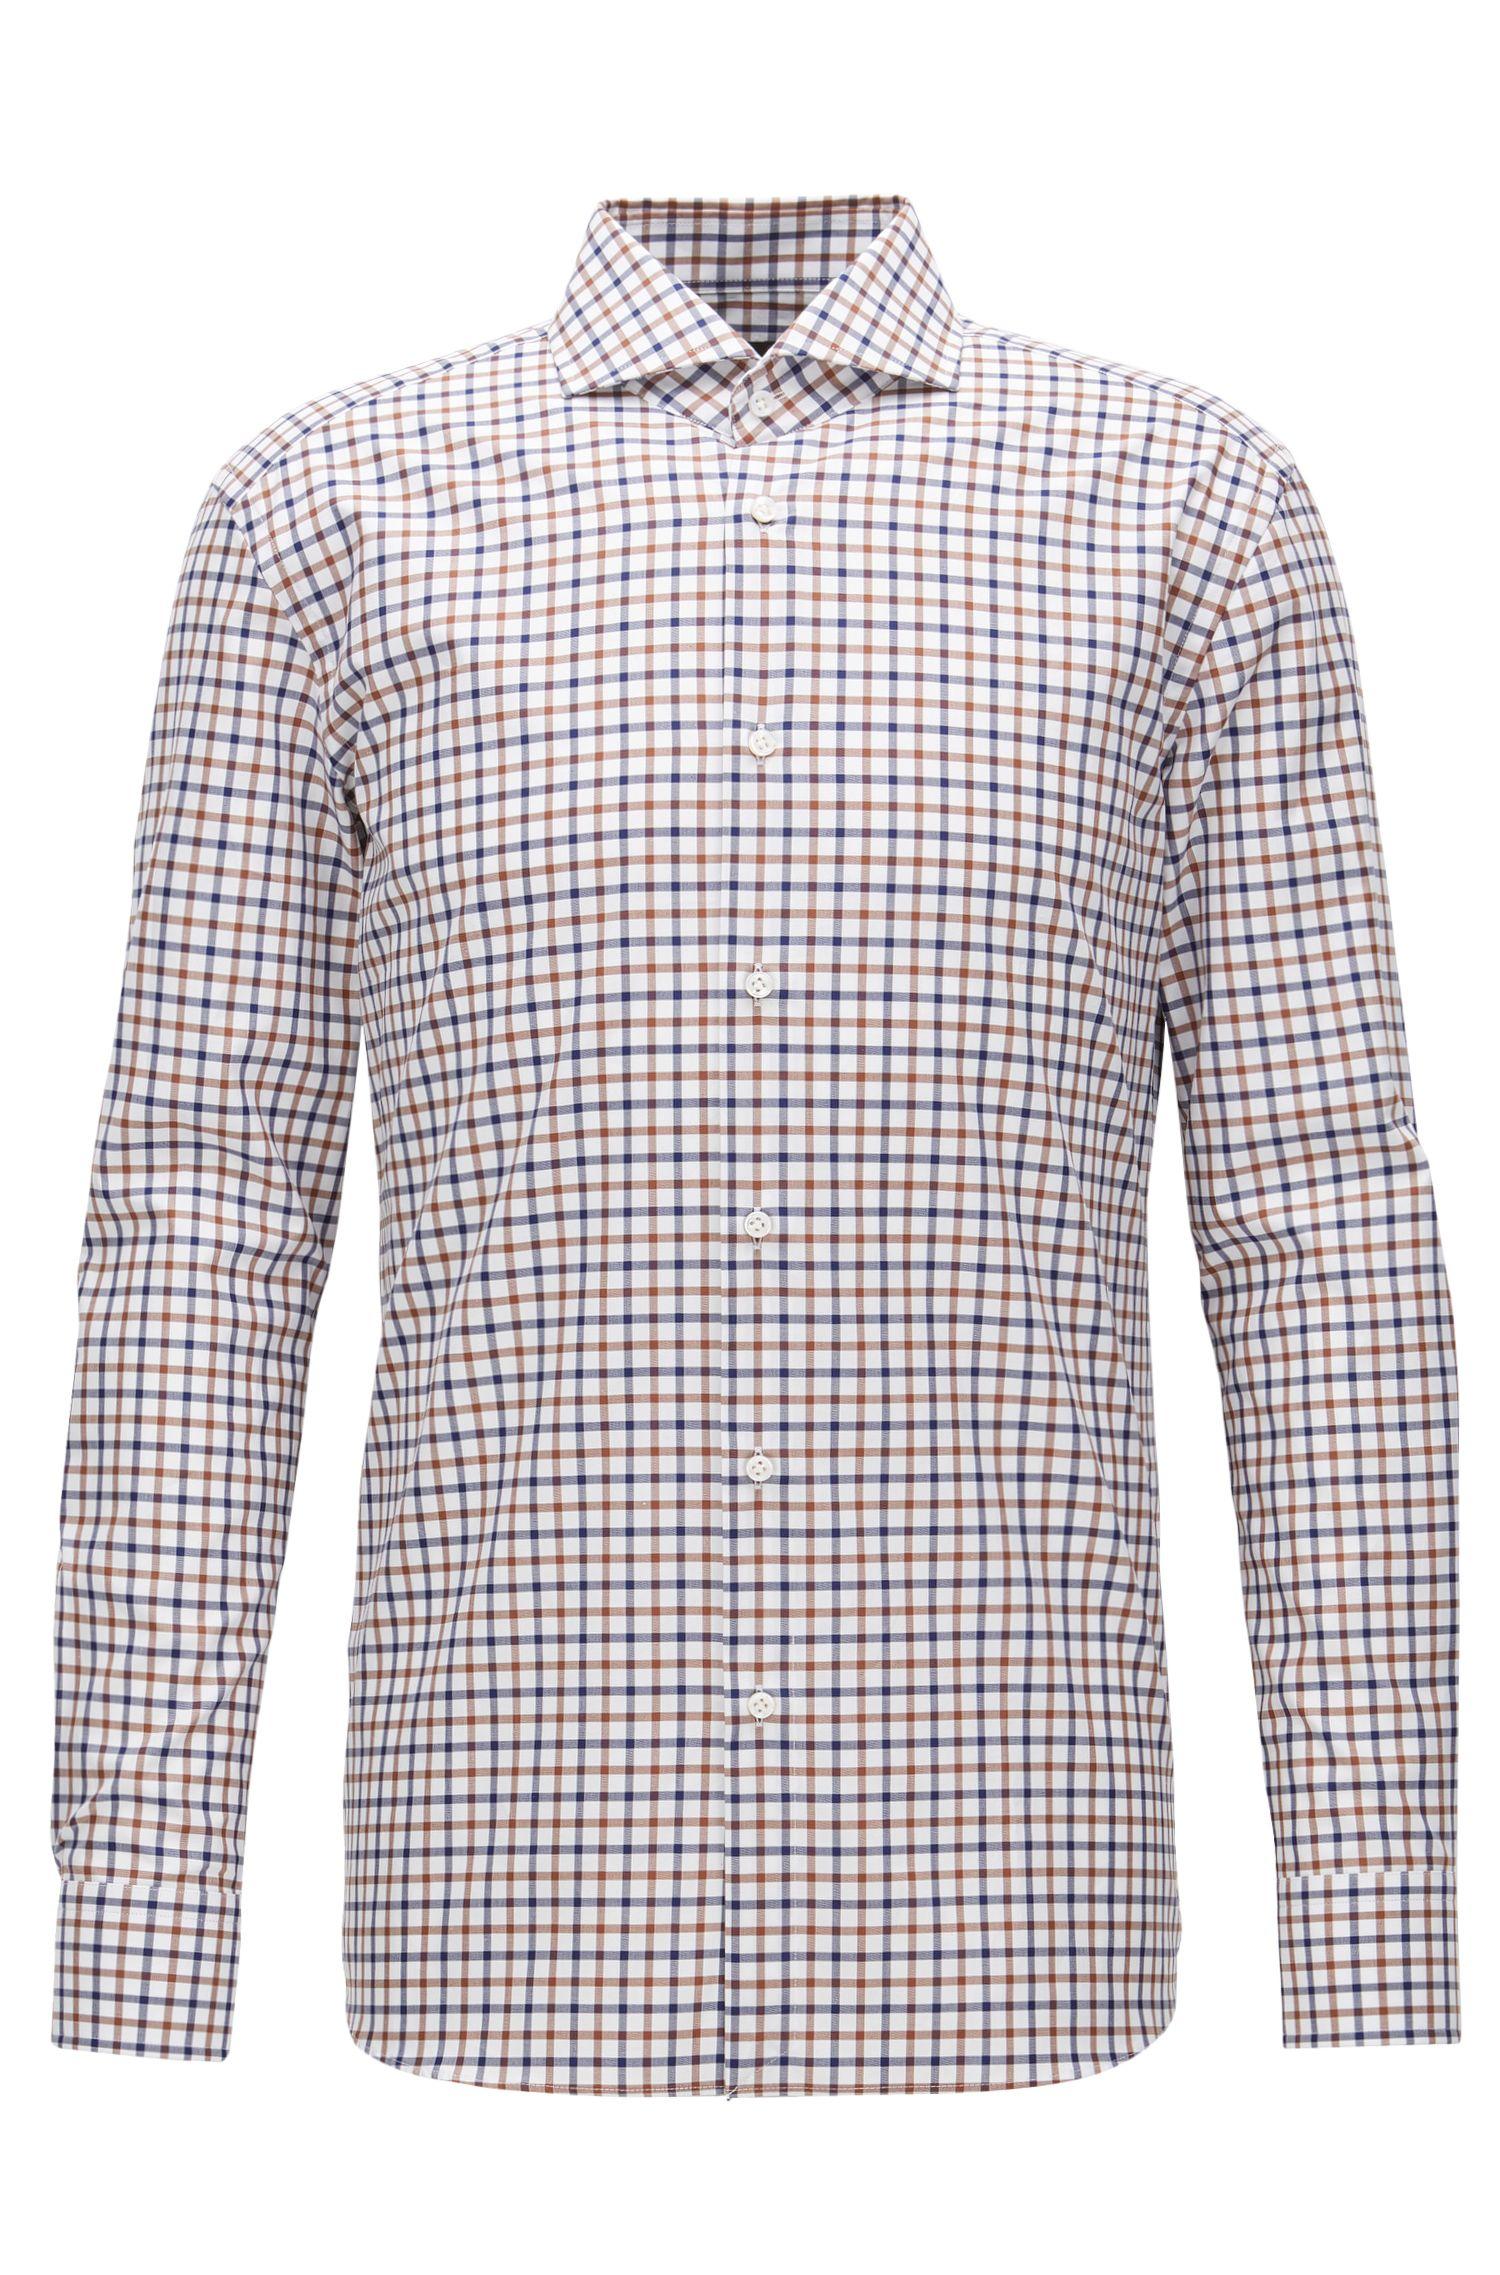 Check Cotton Dress Shirt, Slim Fit | T-Christo